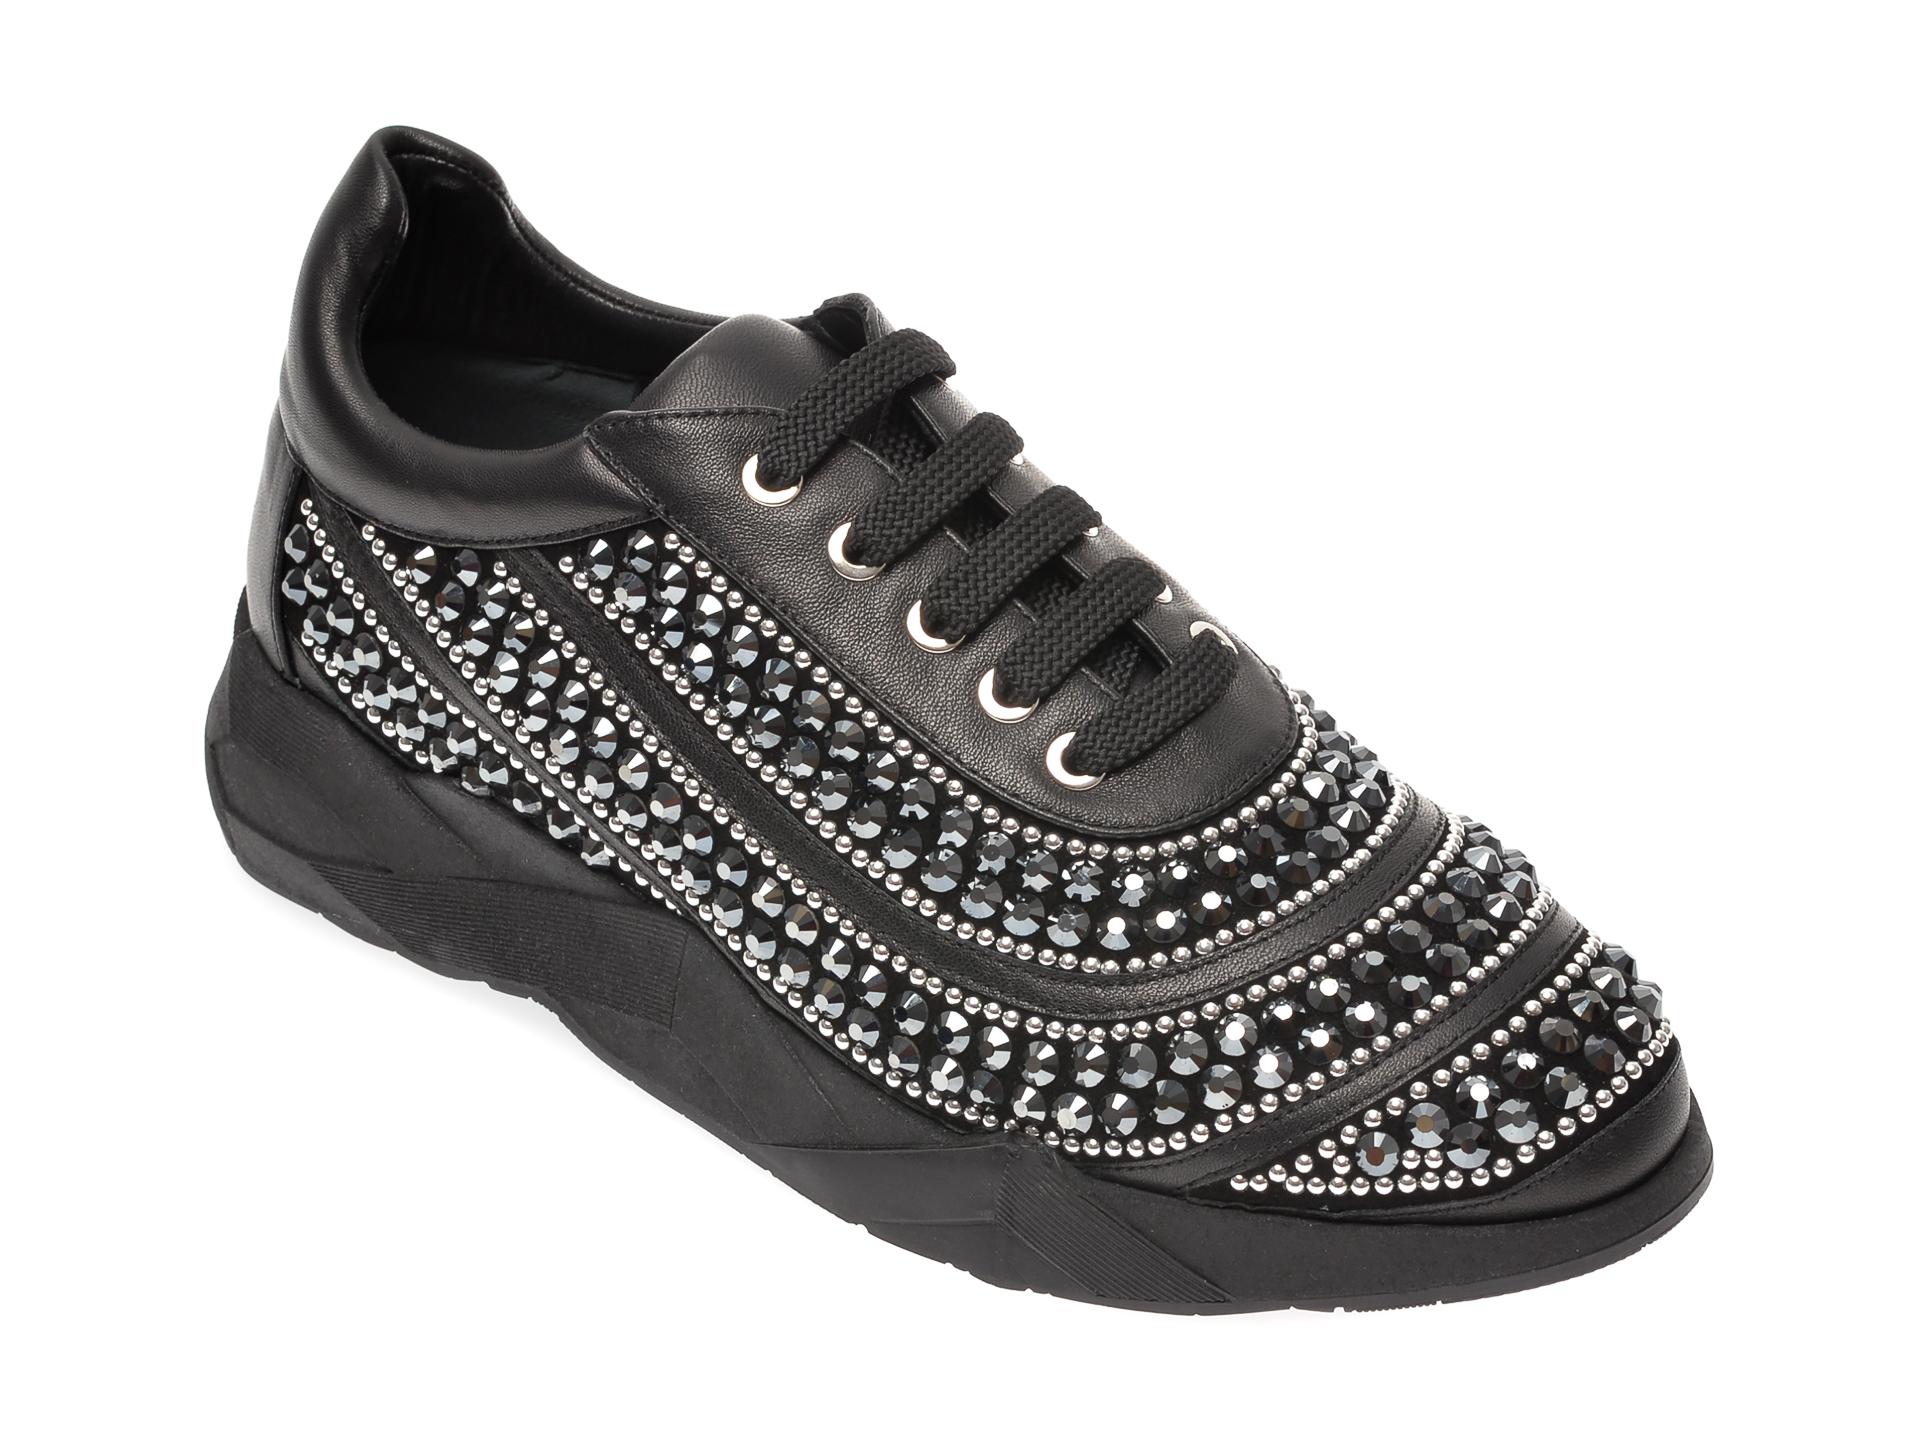 Pantofi LORIBLU negri, 16433, din piele naturala imagine